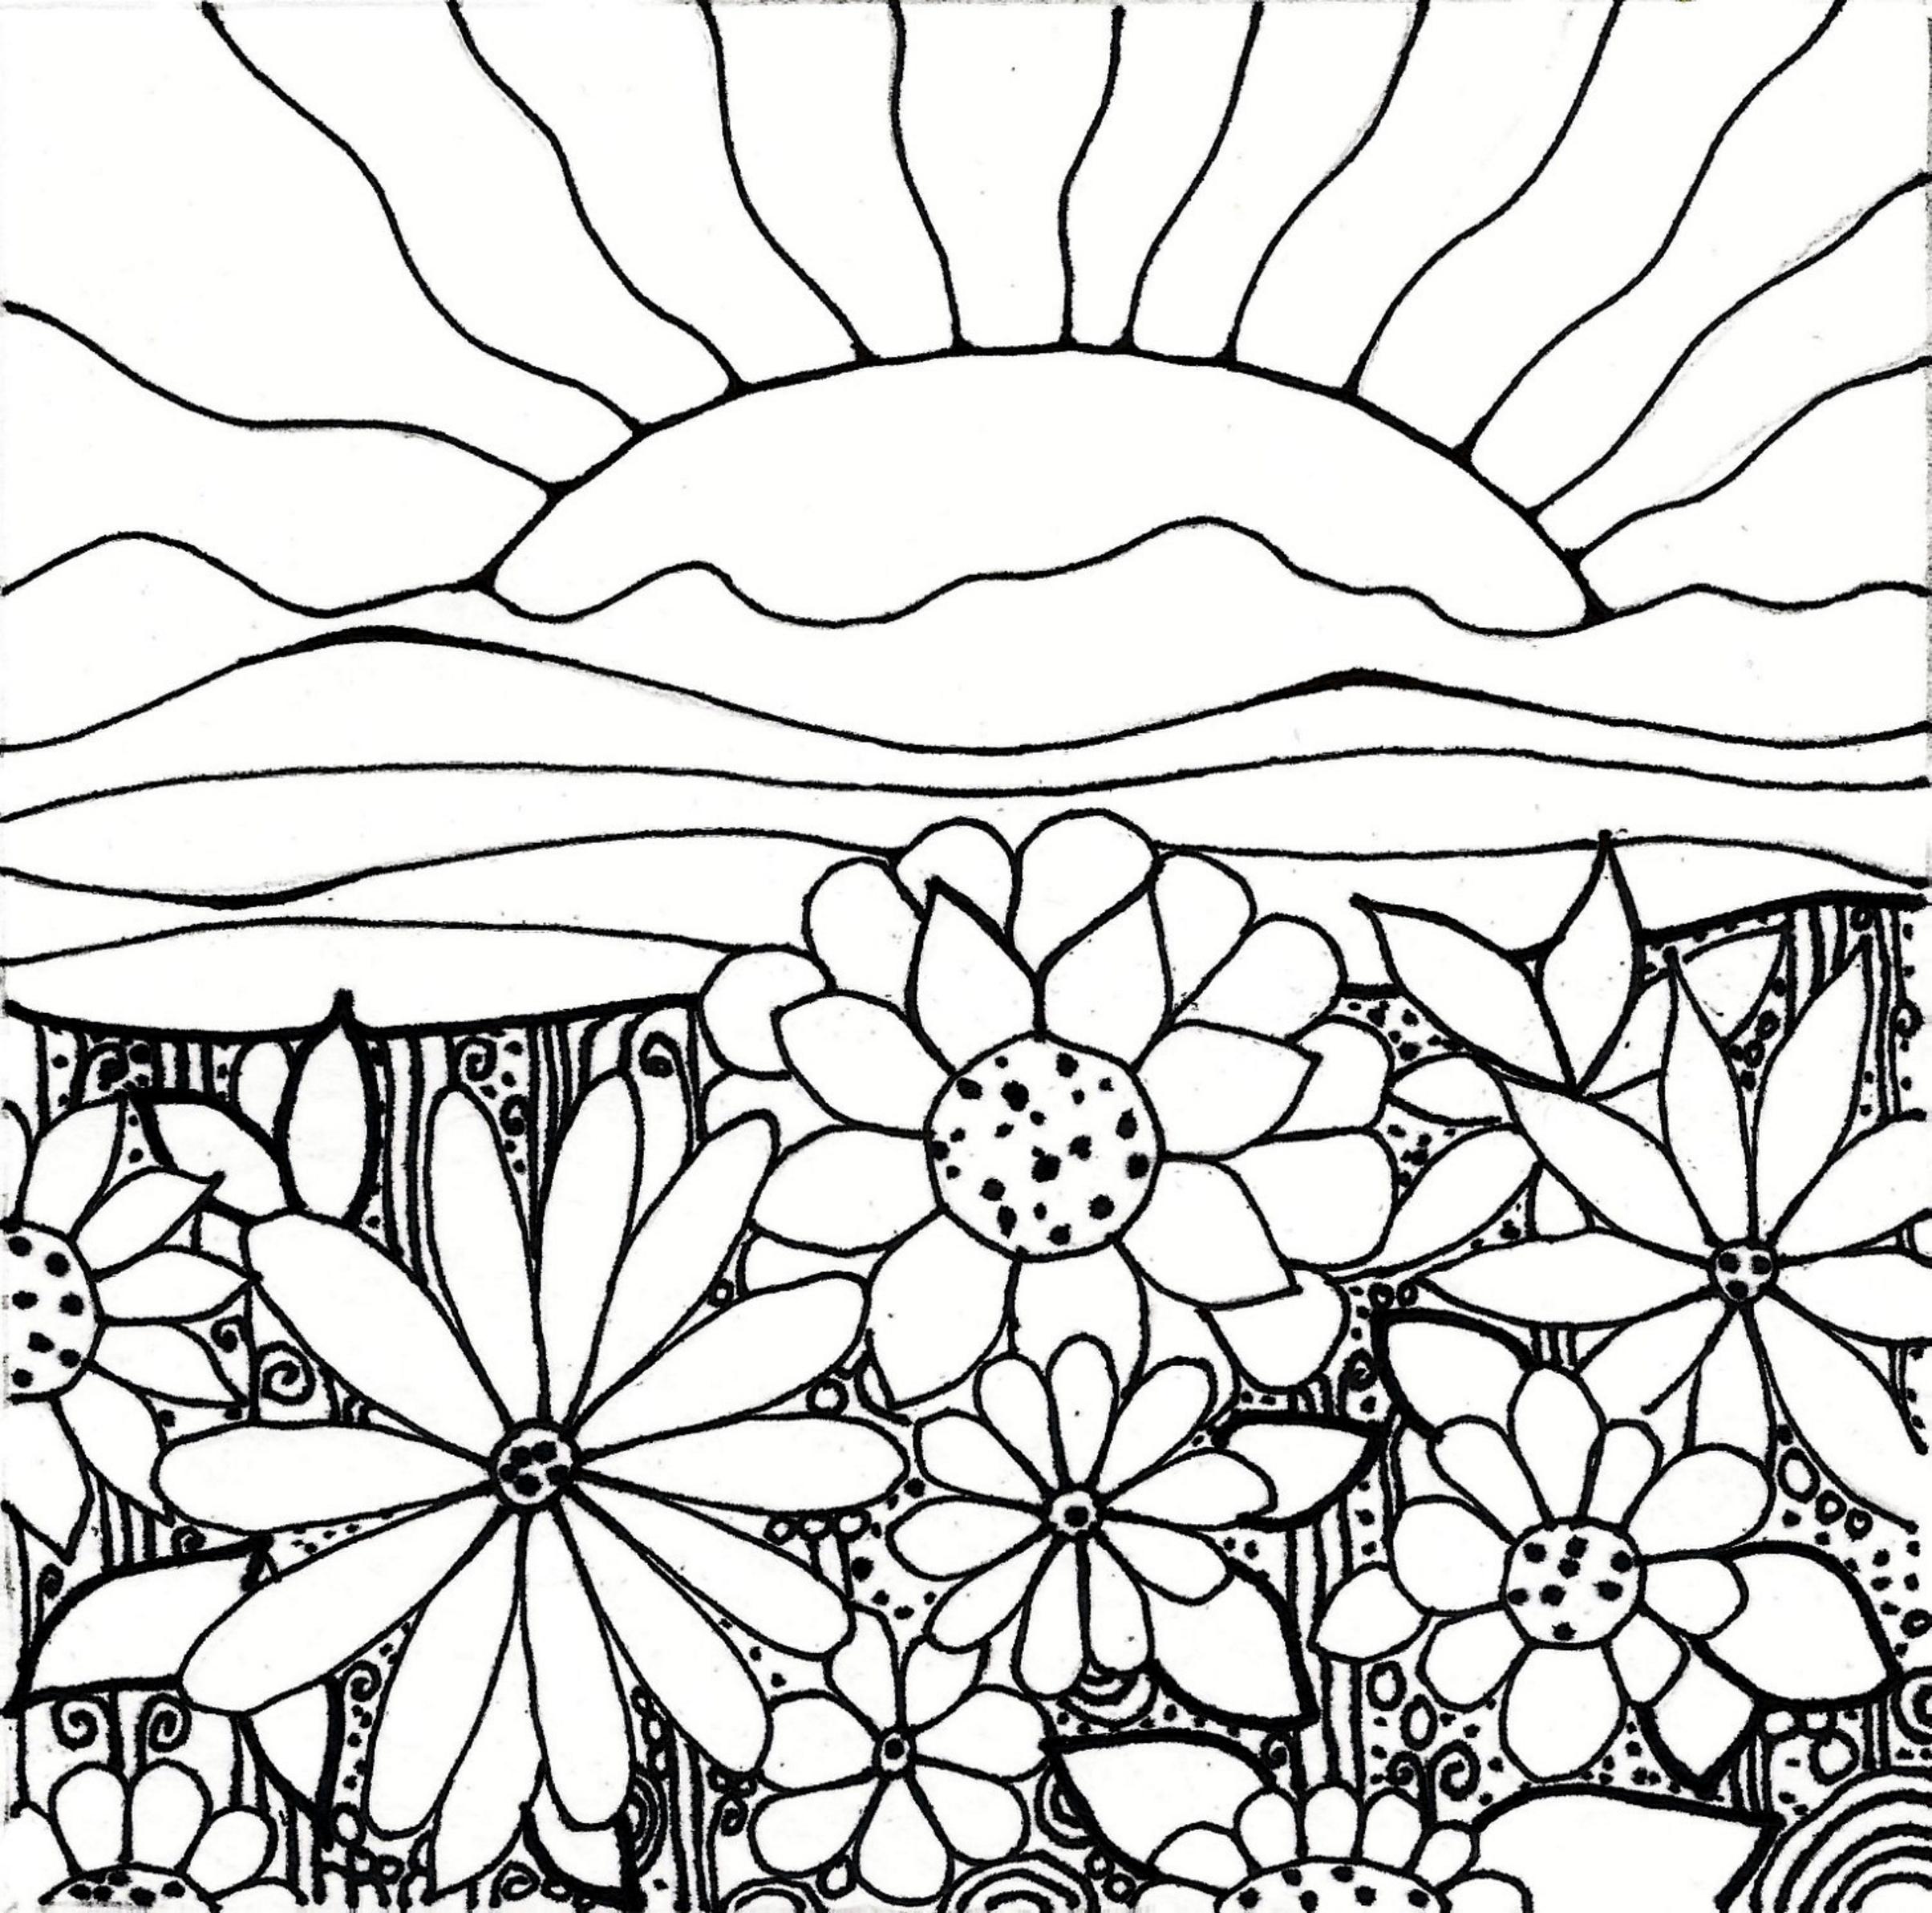 Sunset Pencil Drawing At Getdrawings